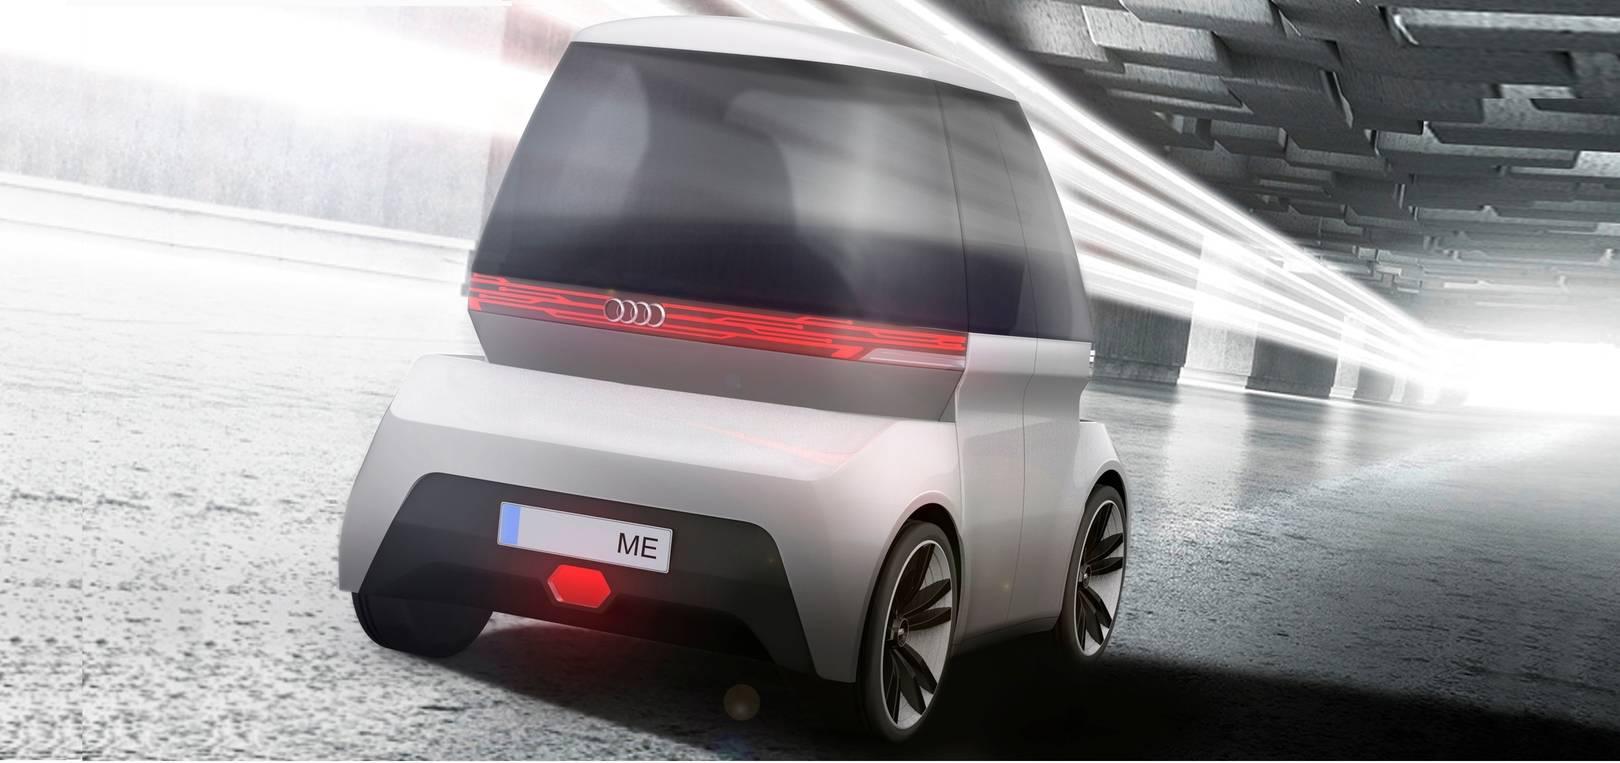 Audi ME